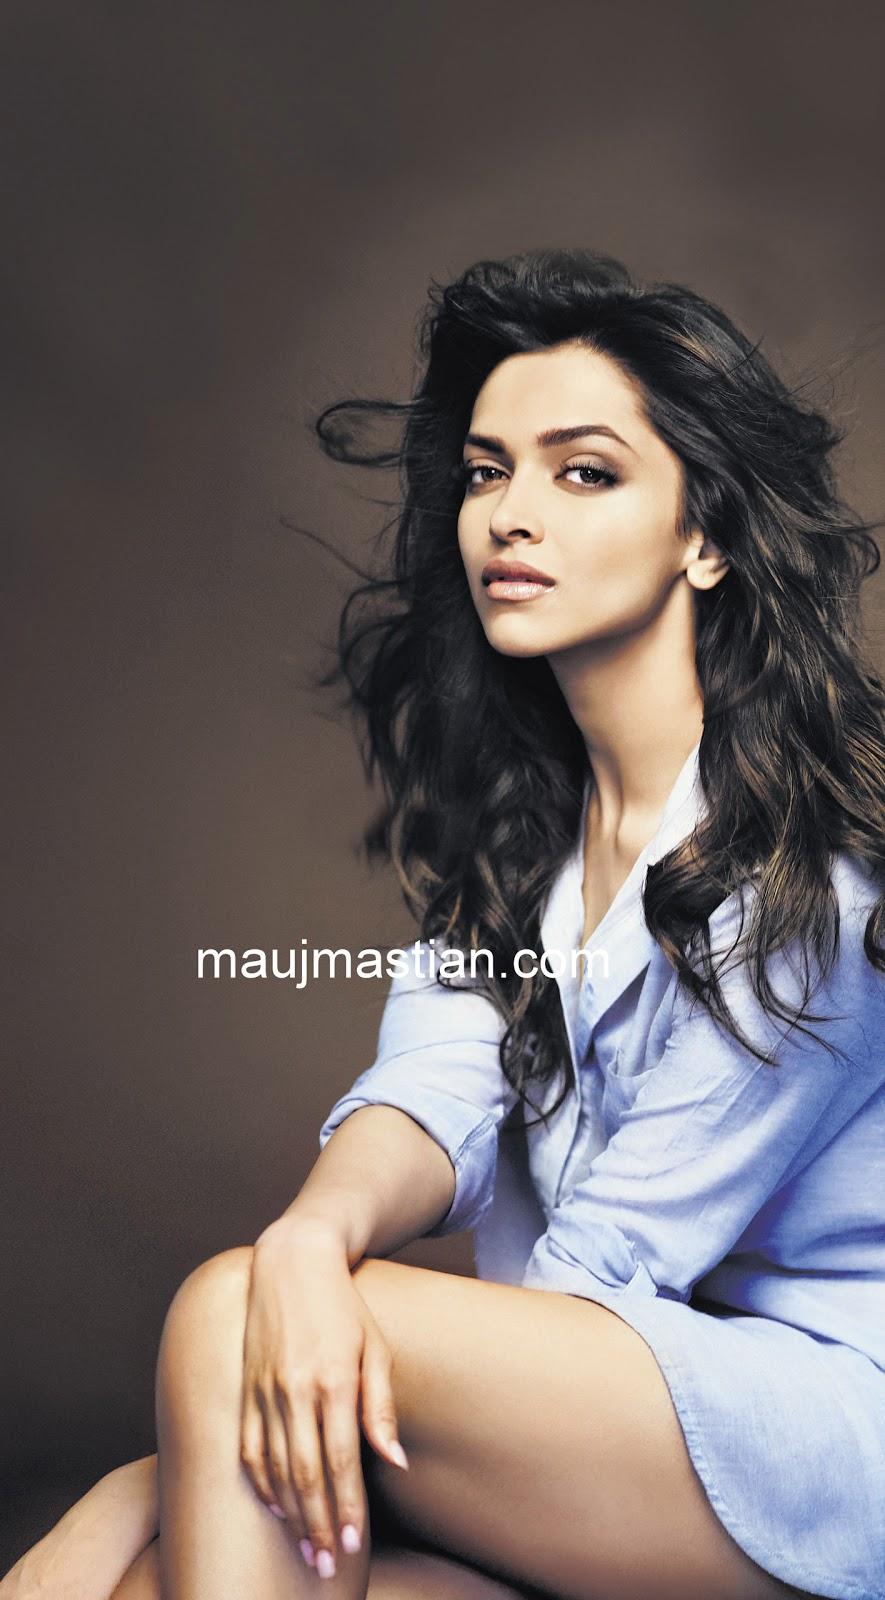 Deepika Padukone Hot Thigs Show In Shirt Sexy Pose - Uhq -9631